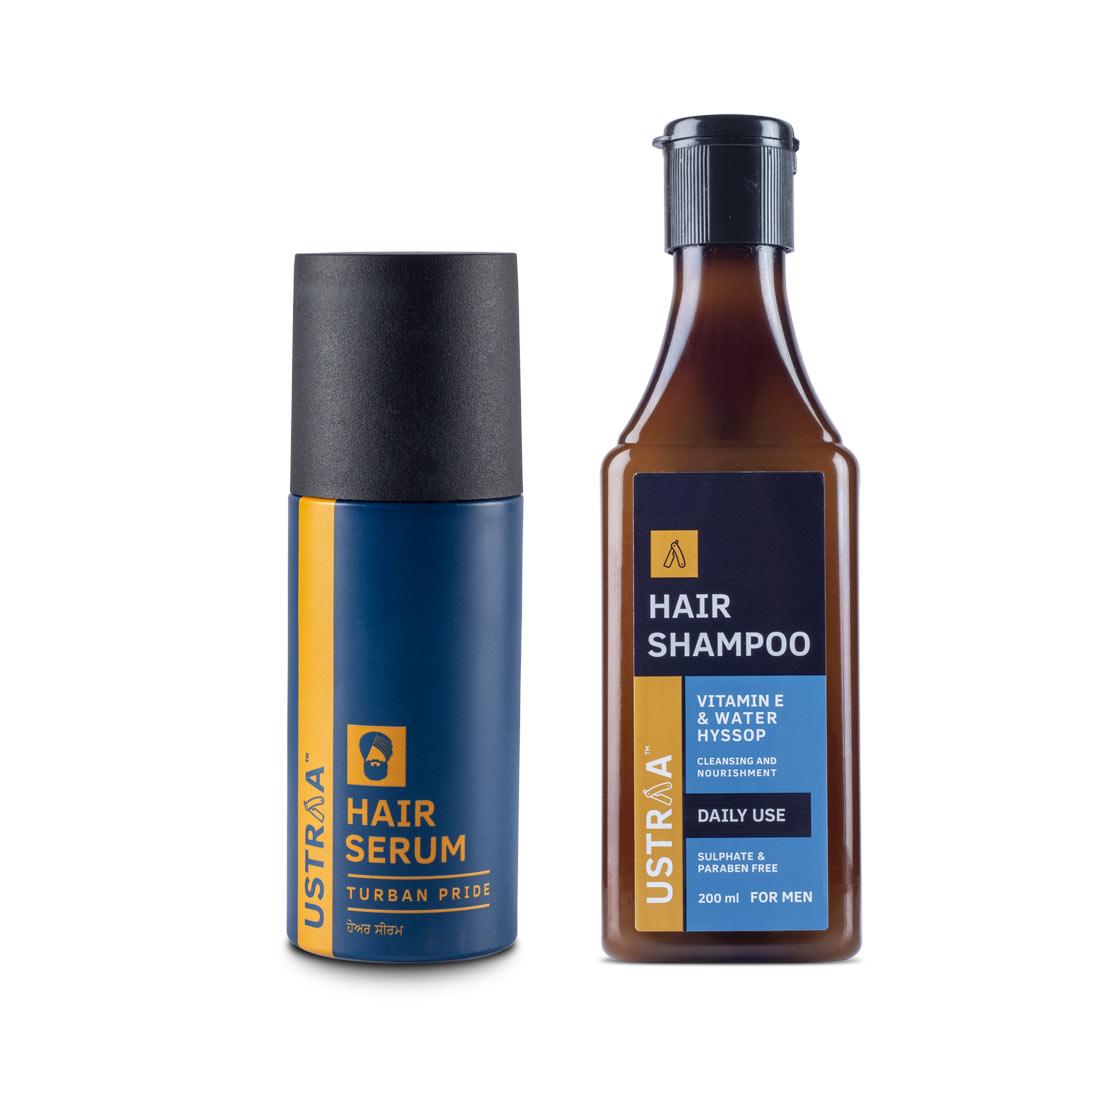 Daily Use Shampoo & Turban Pride Hair Serum